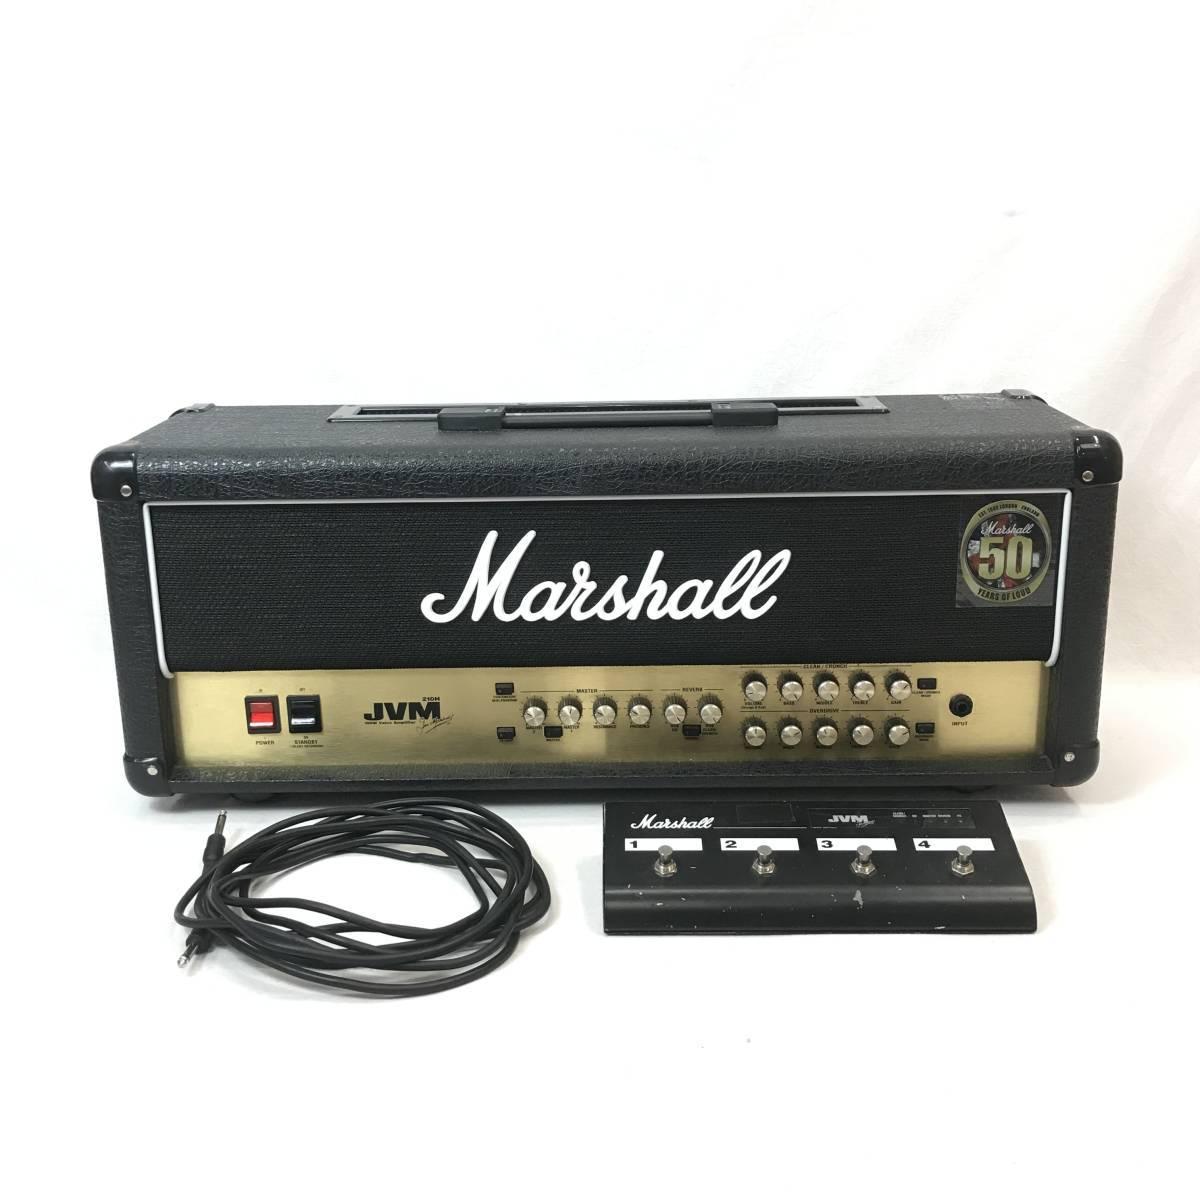 Marshall JVH210H